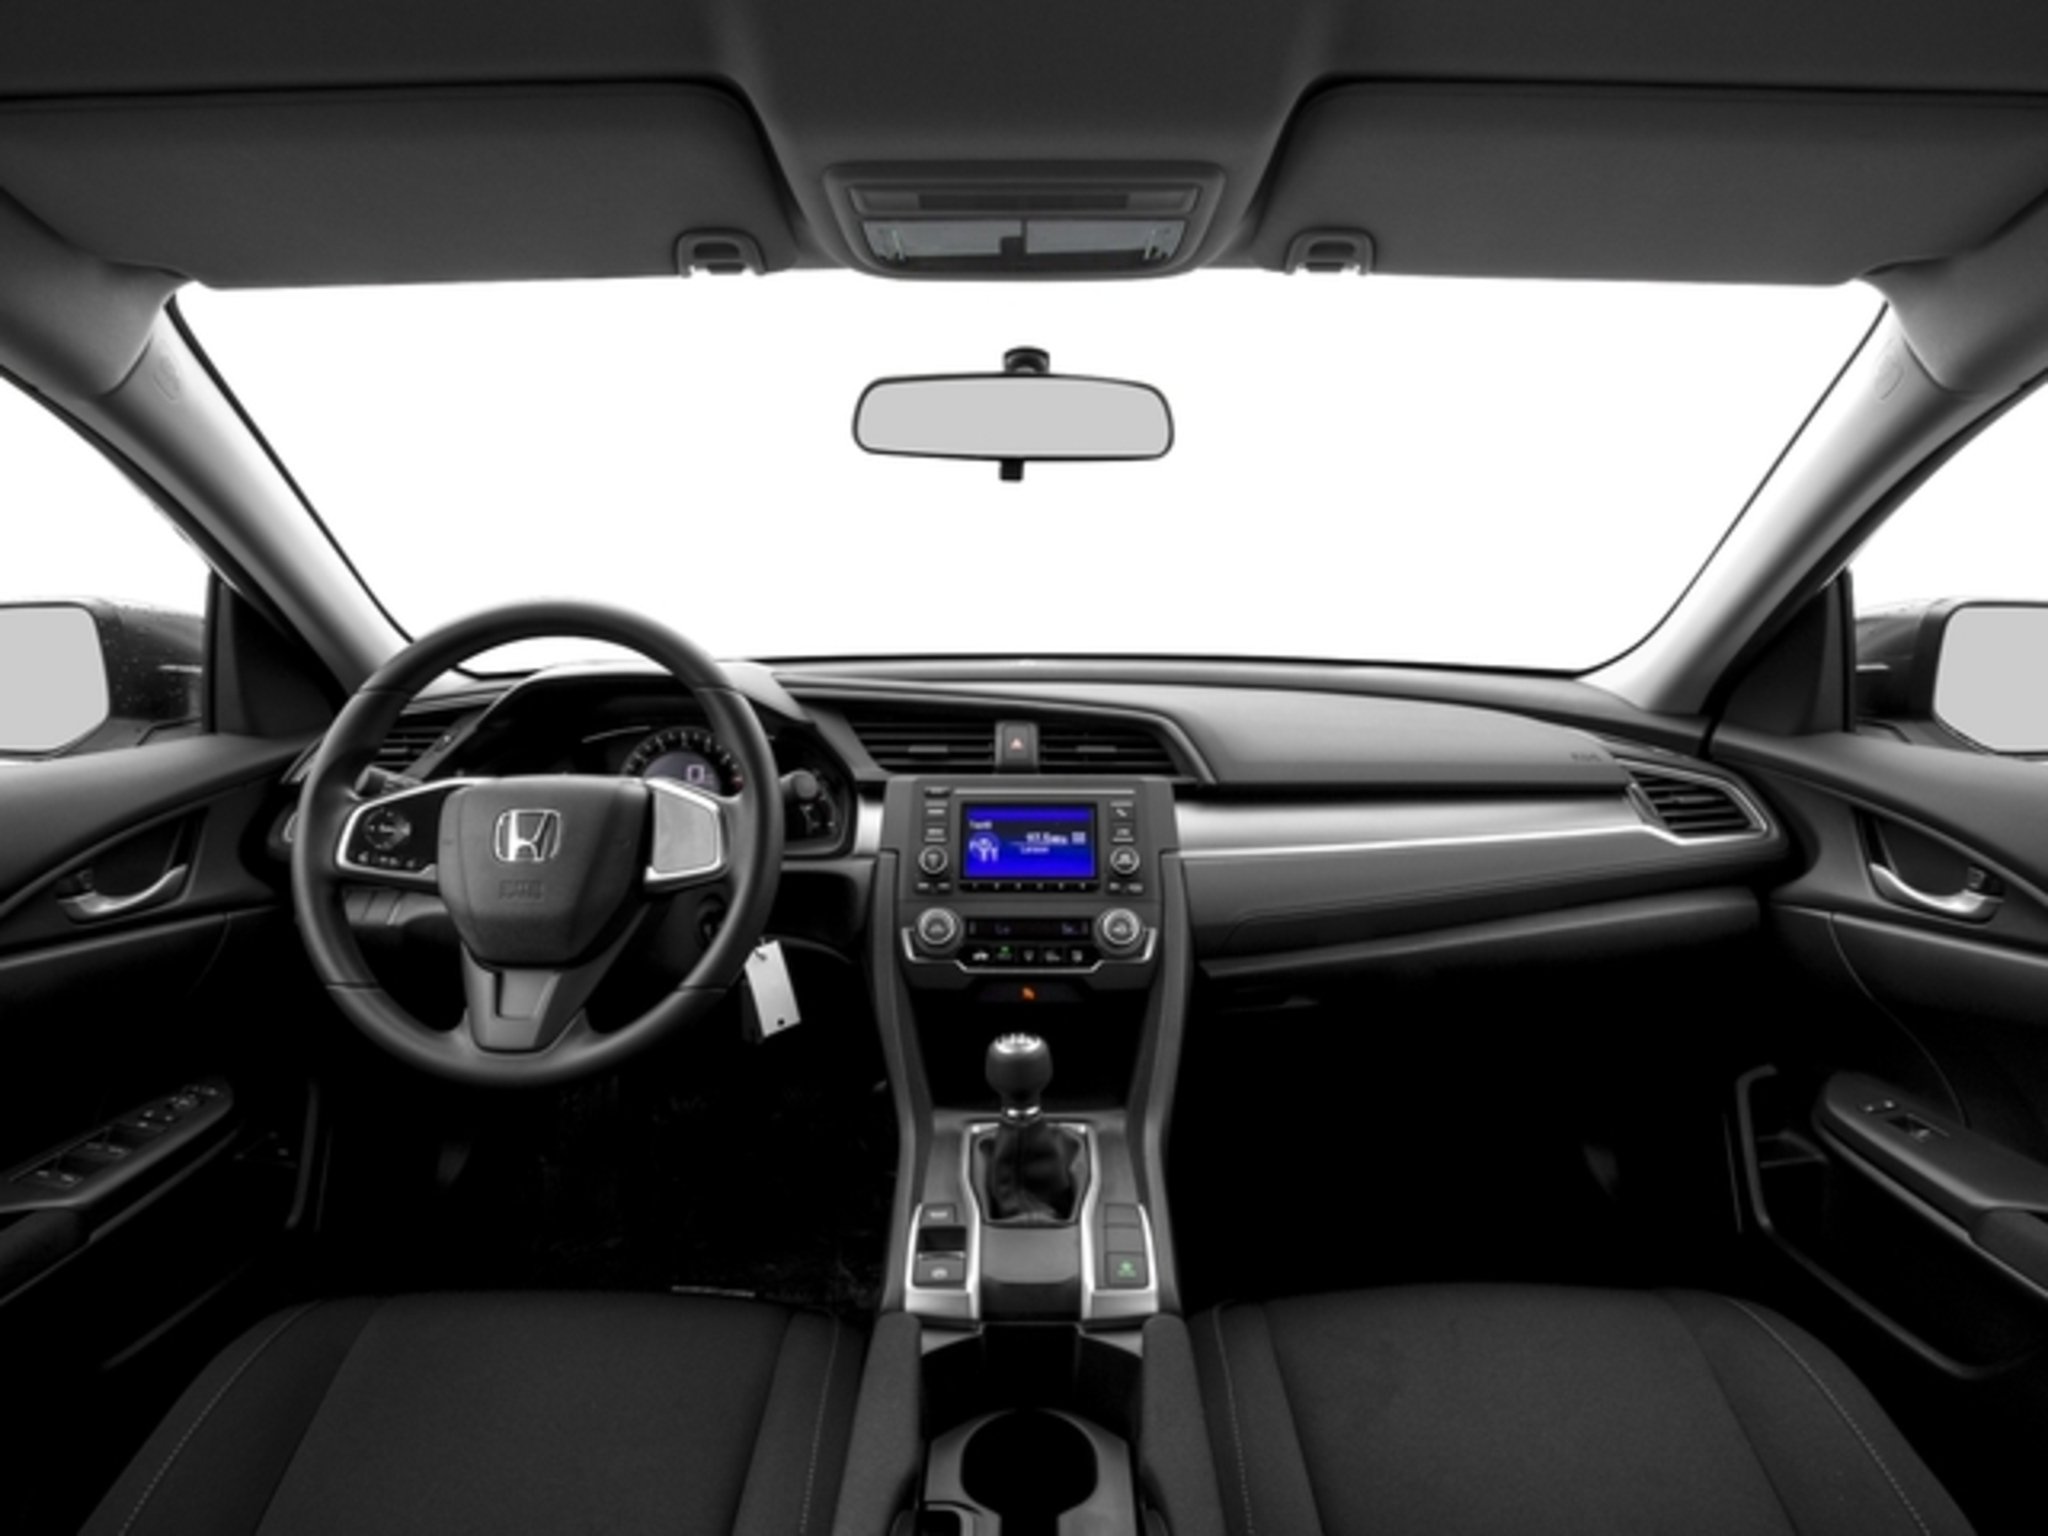 Hyundai Elantra 2013 Tire Size >> 2017 Honda Civic Sedan - Compare Prices, Trims, Options ...